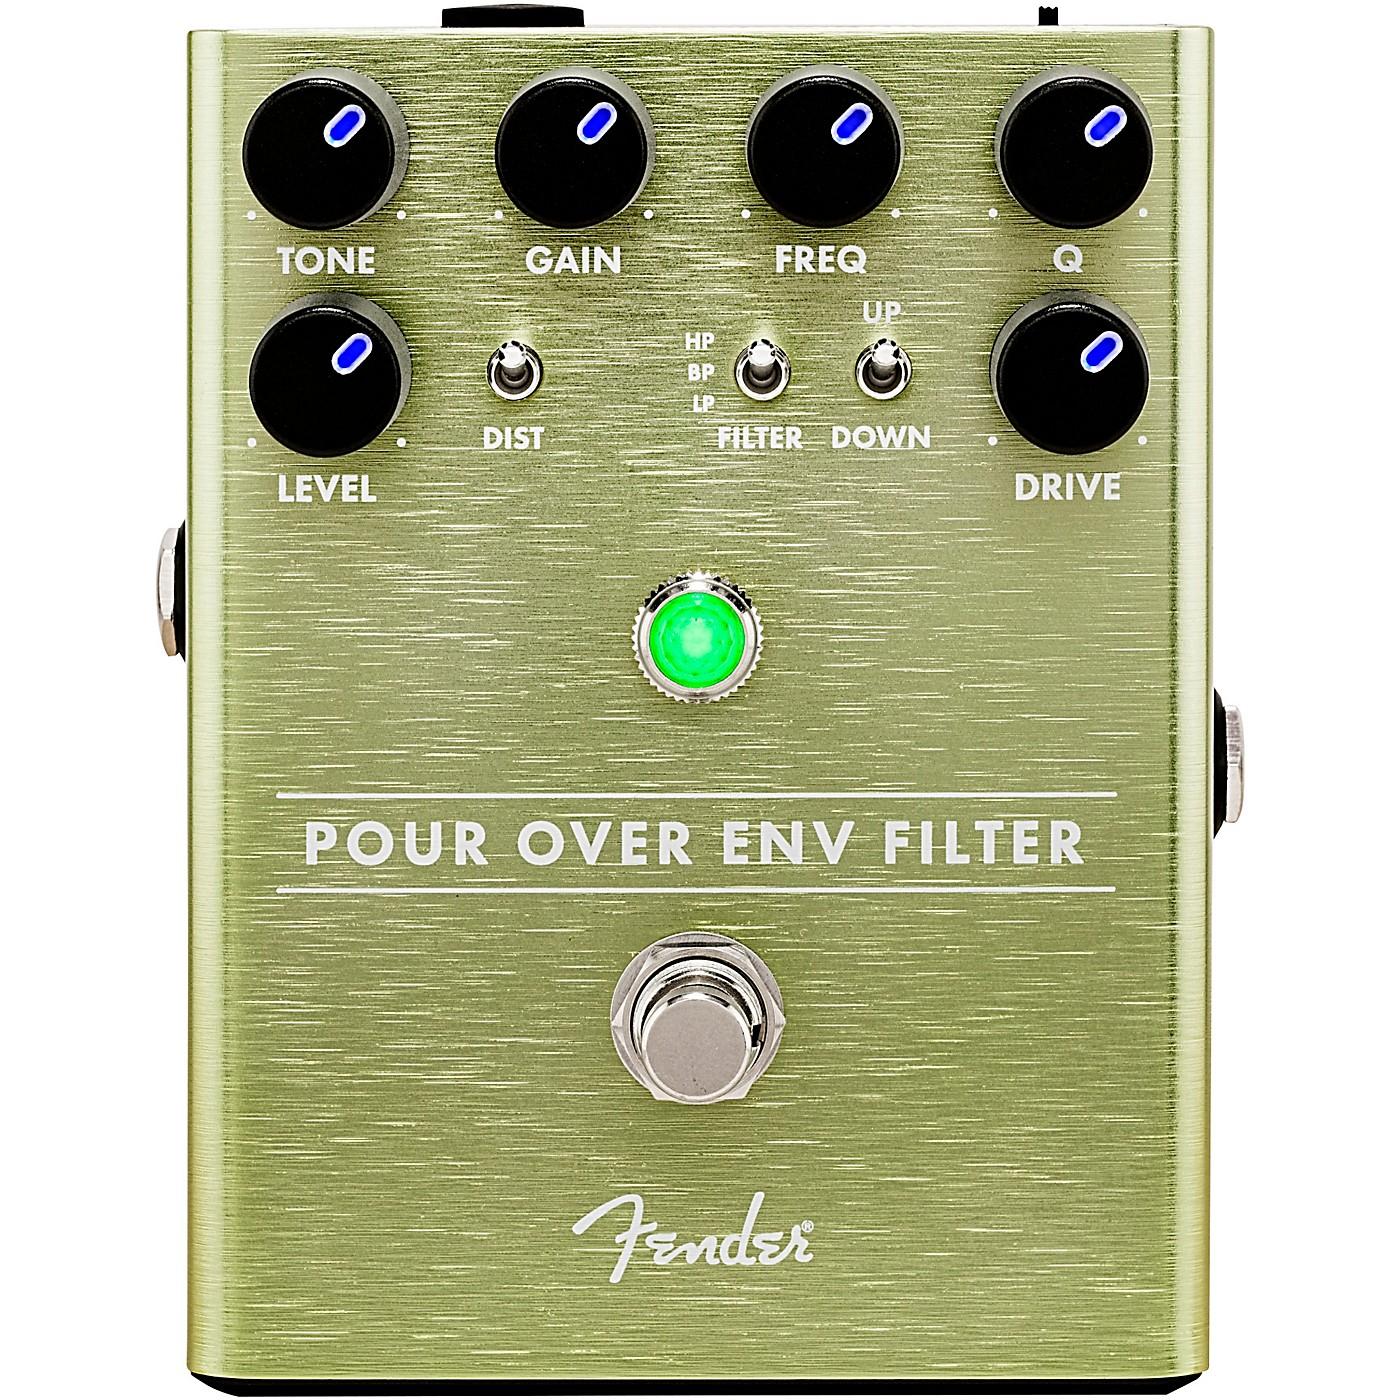 Fender Pour Over Envelope Filter Effects Pedal thumbnail